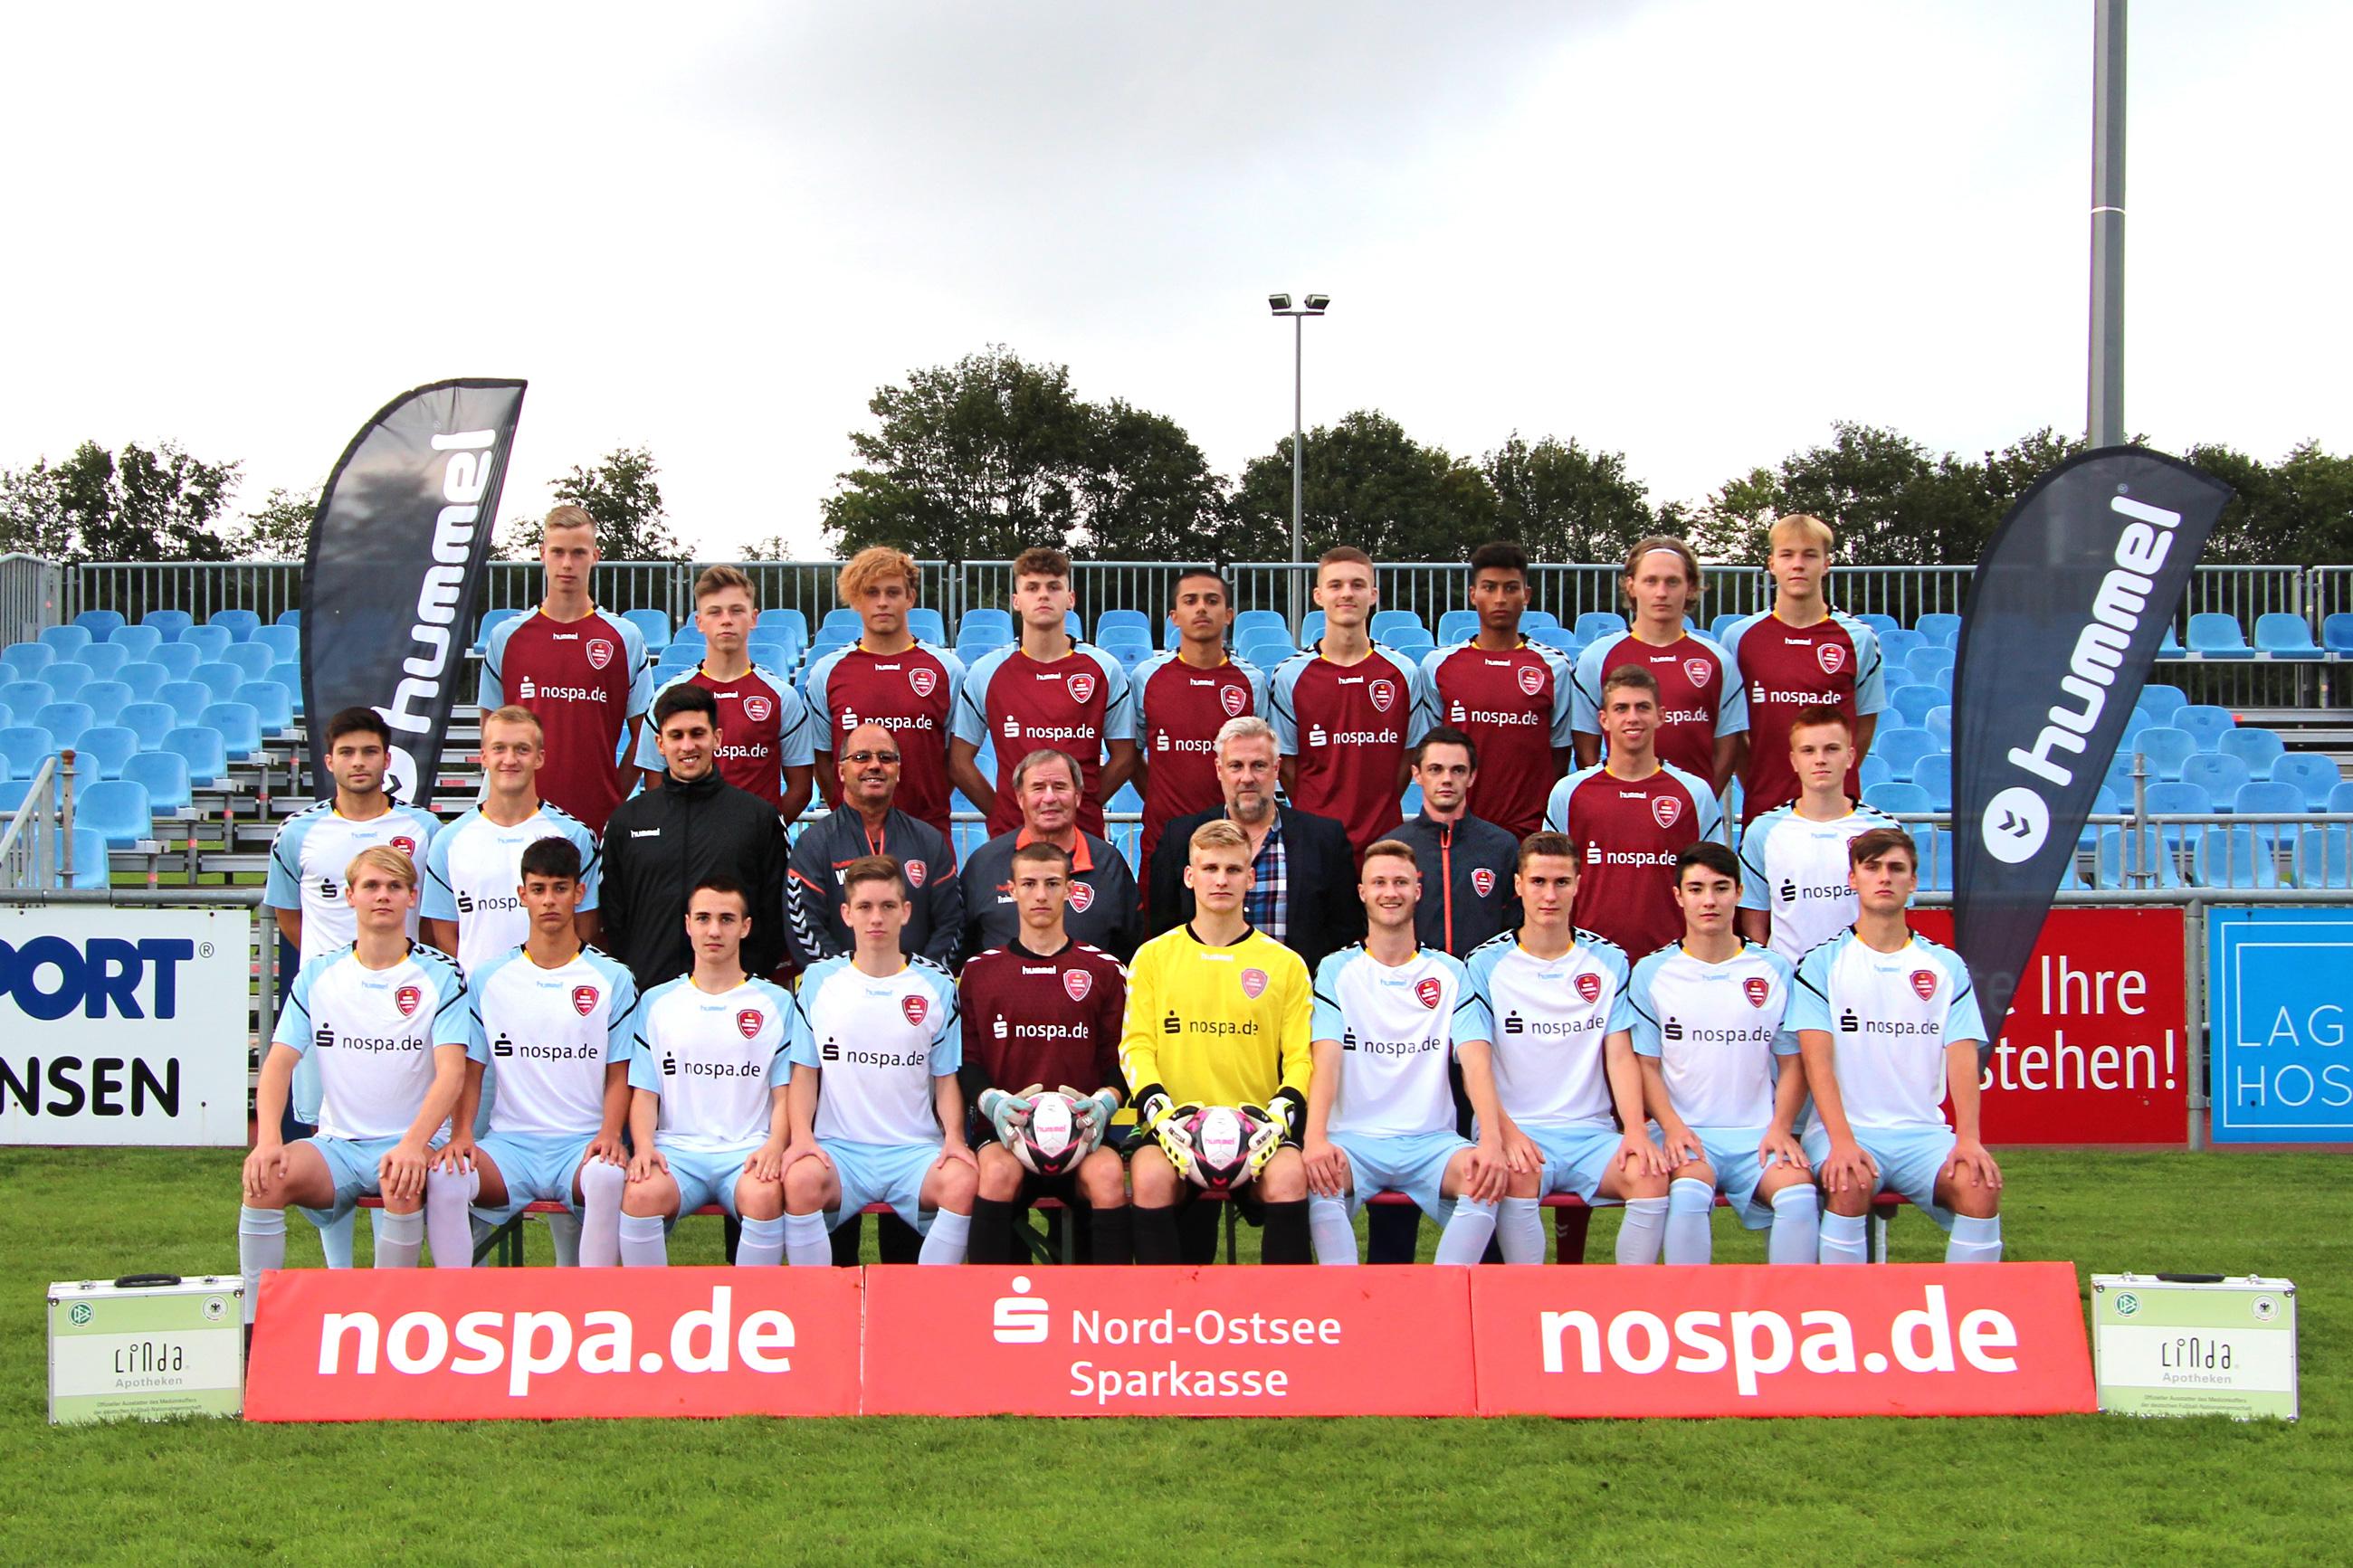 SC Weiche Flensburg 08, A-Jugend 2019/20